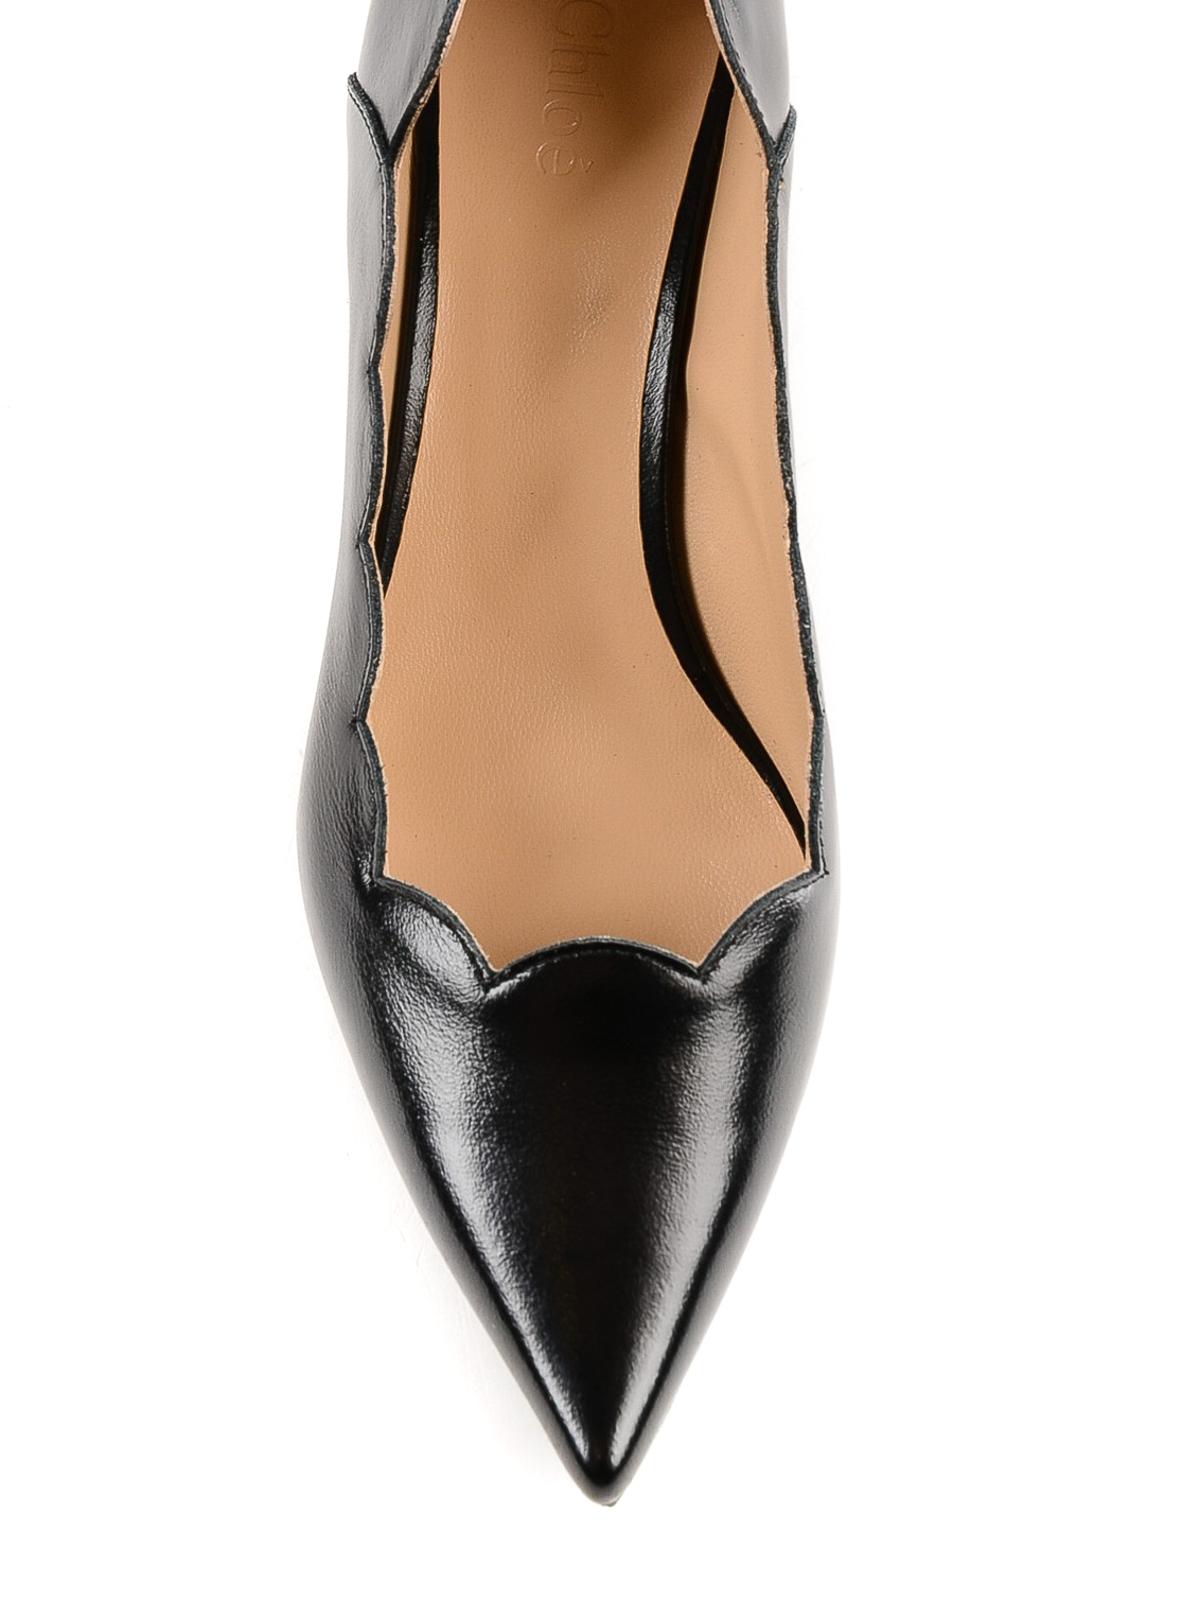 daff127ac11b Chloe  - Lauren polished leather scalloped pumps - court shoes ...